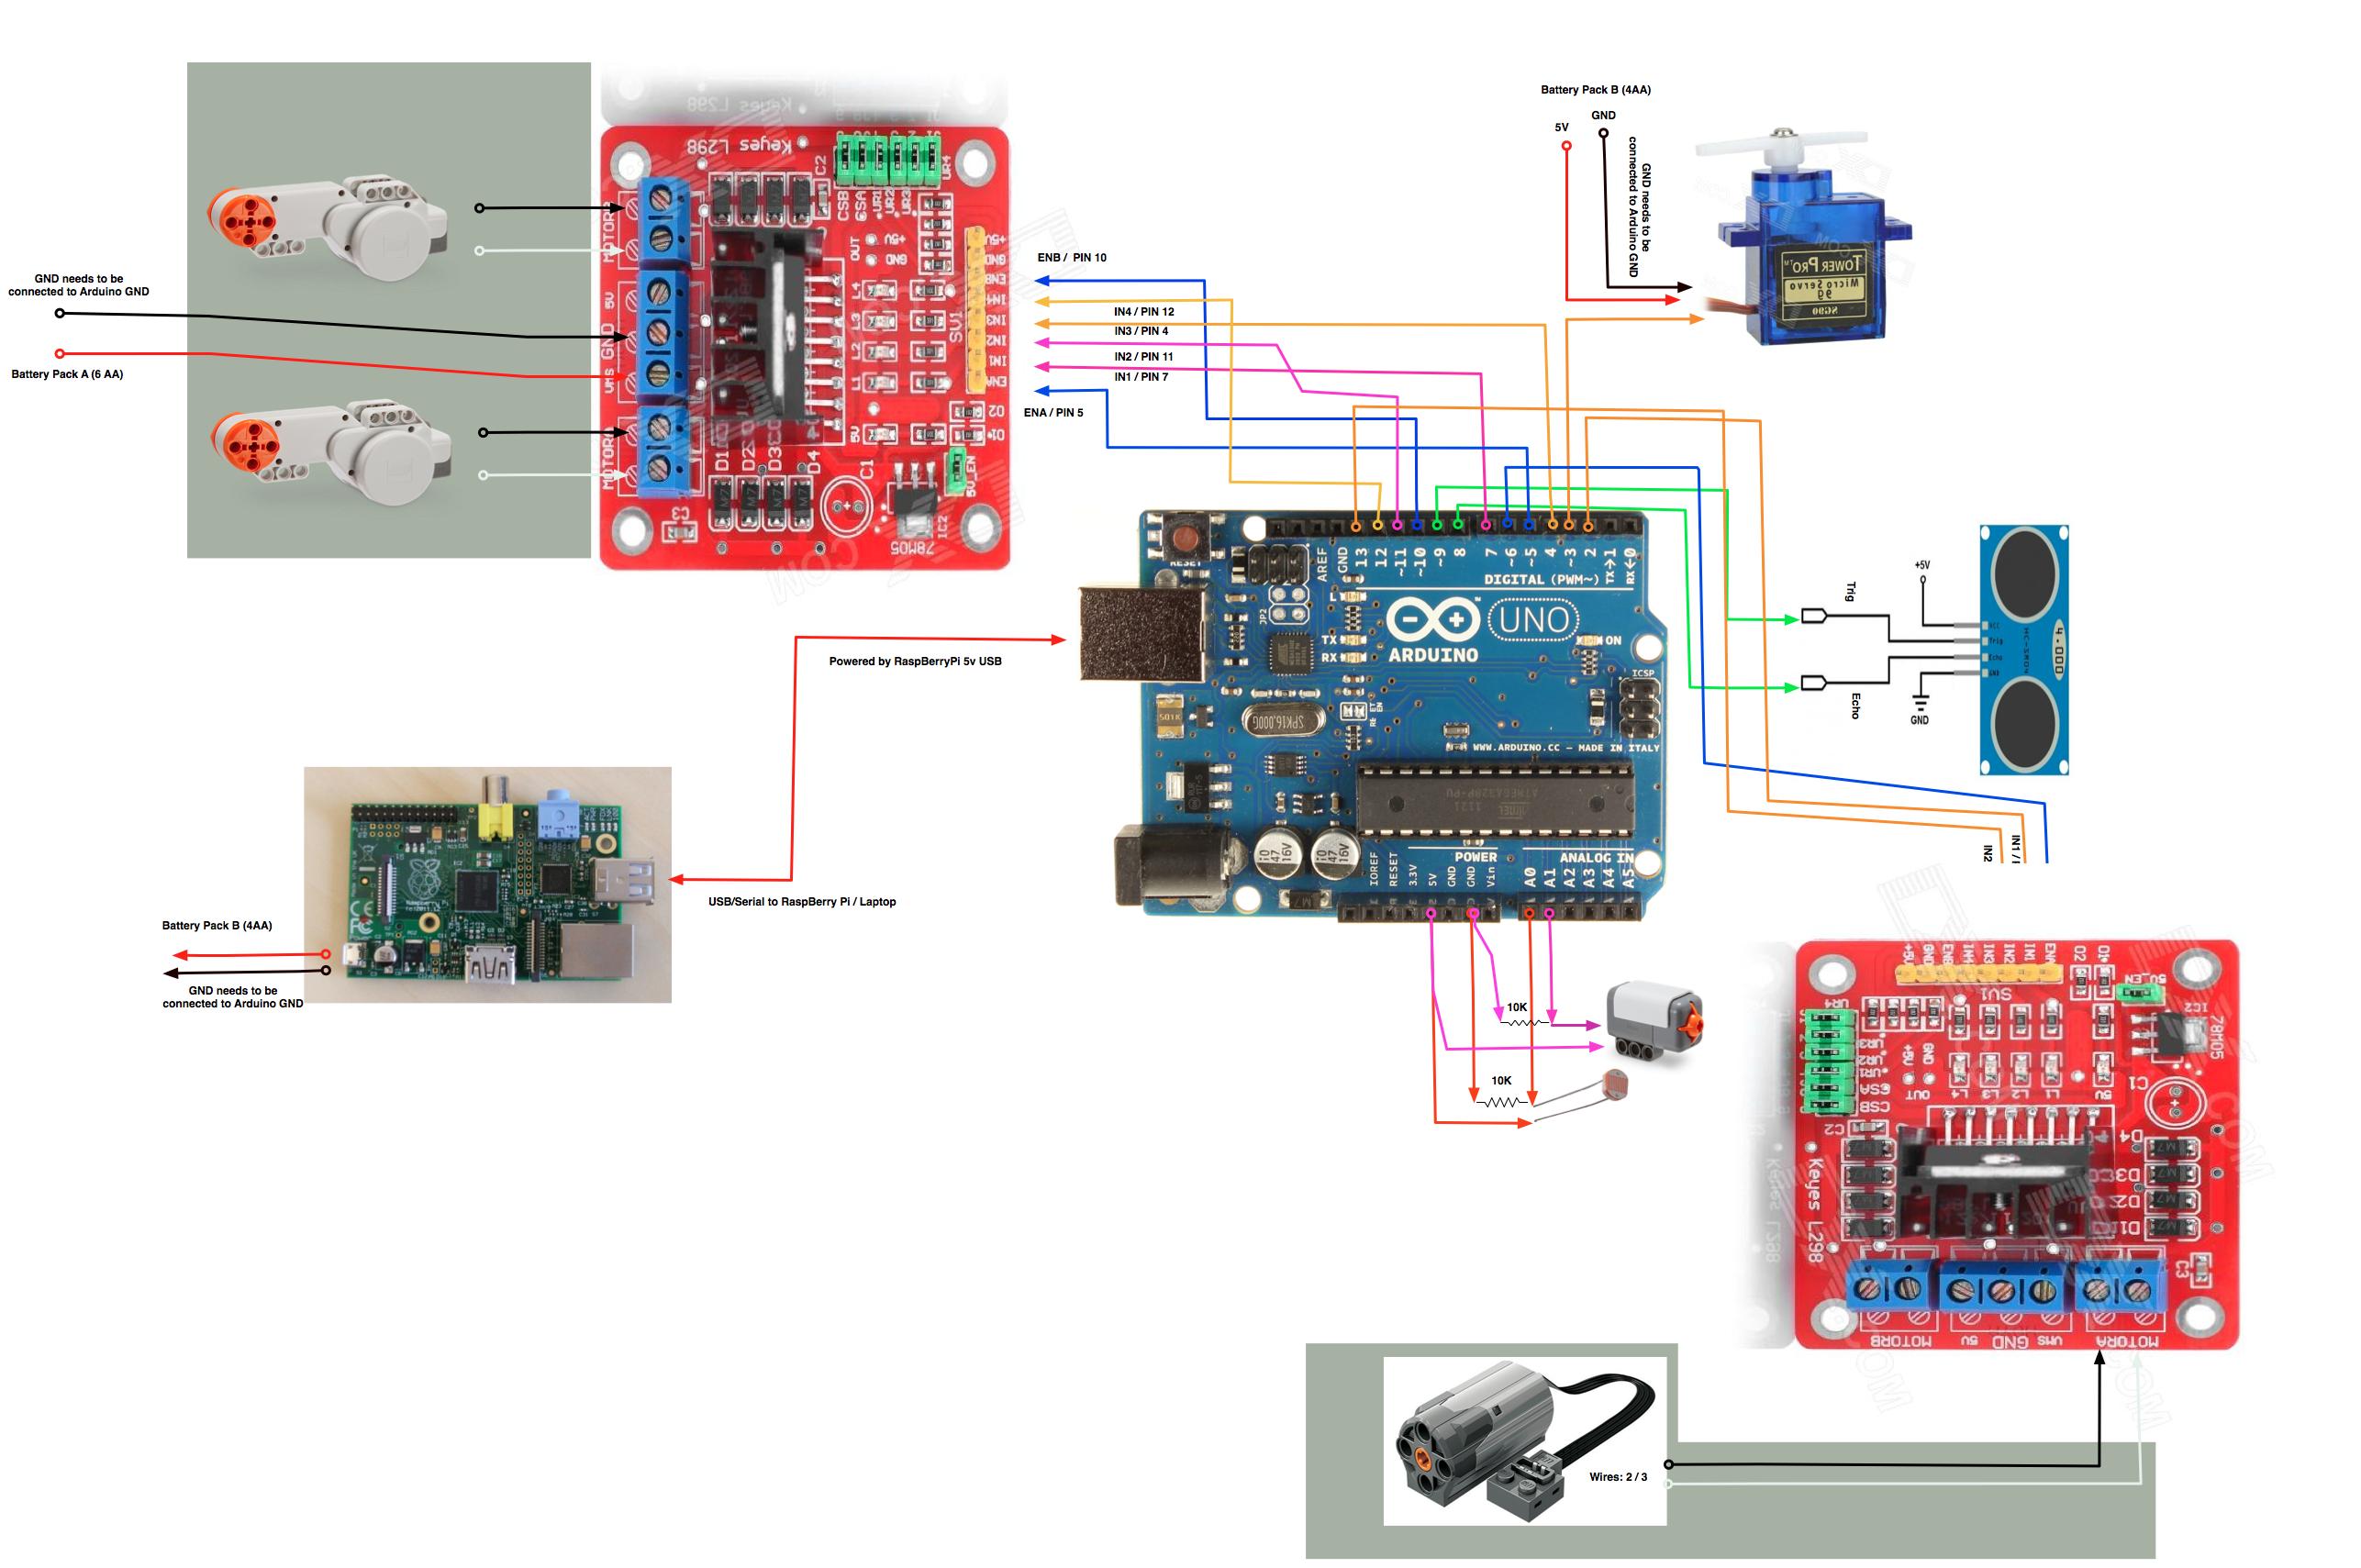 Sg servo wiring free engine image for user manual